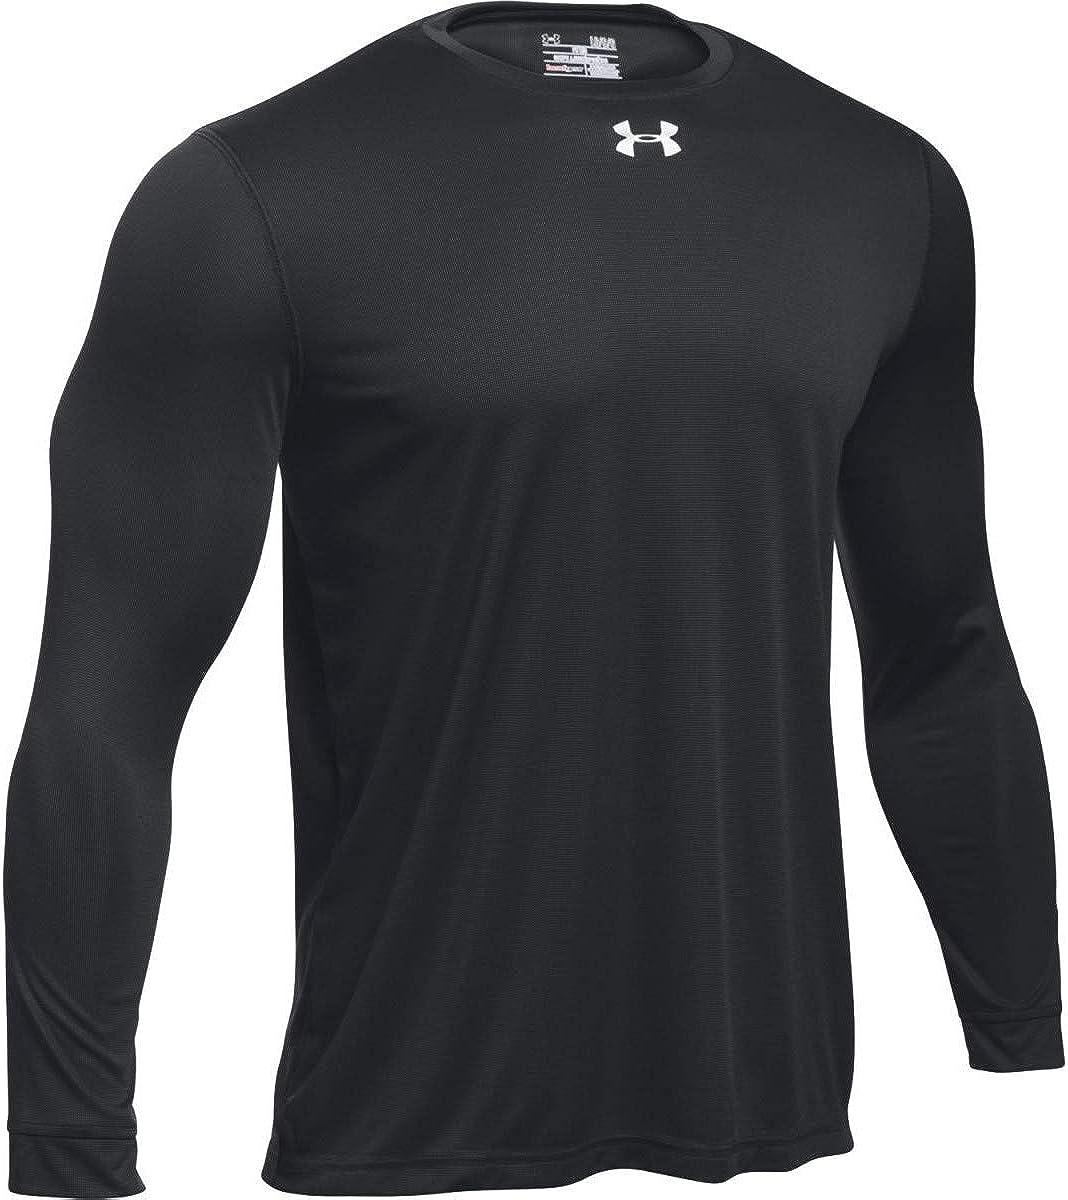 Large, Black Under Armour Mens UA Locker 2.0 Long Sleeve Shirt